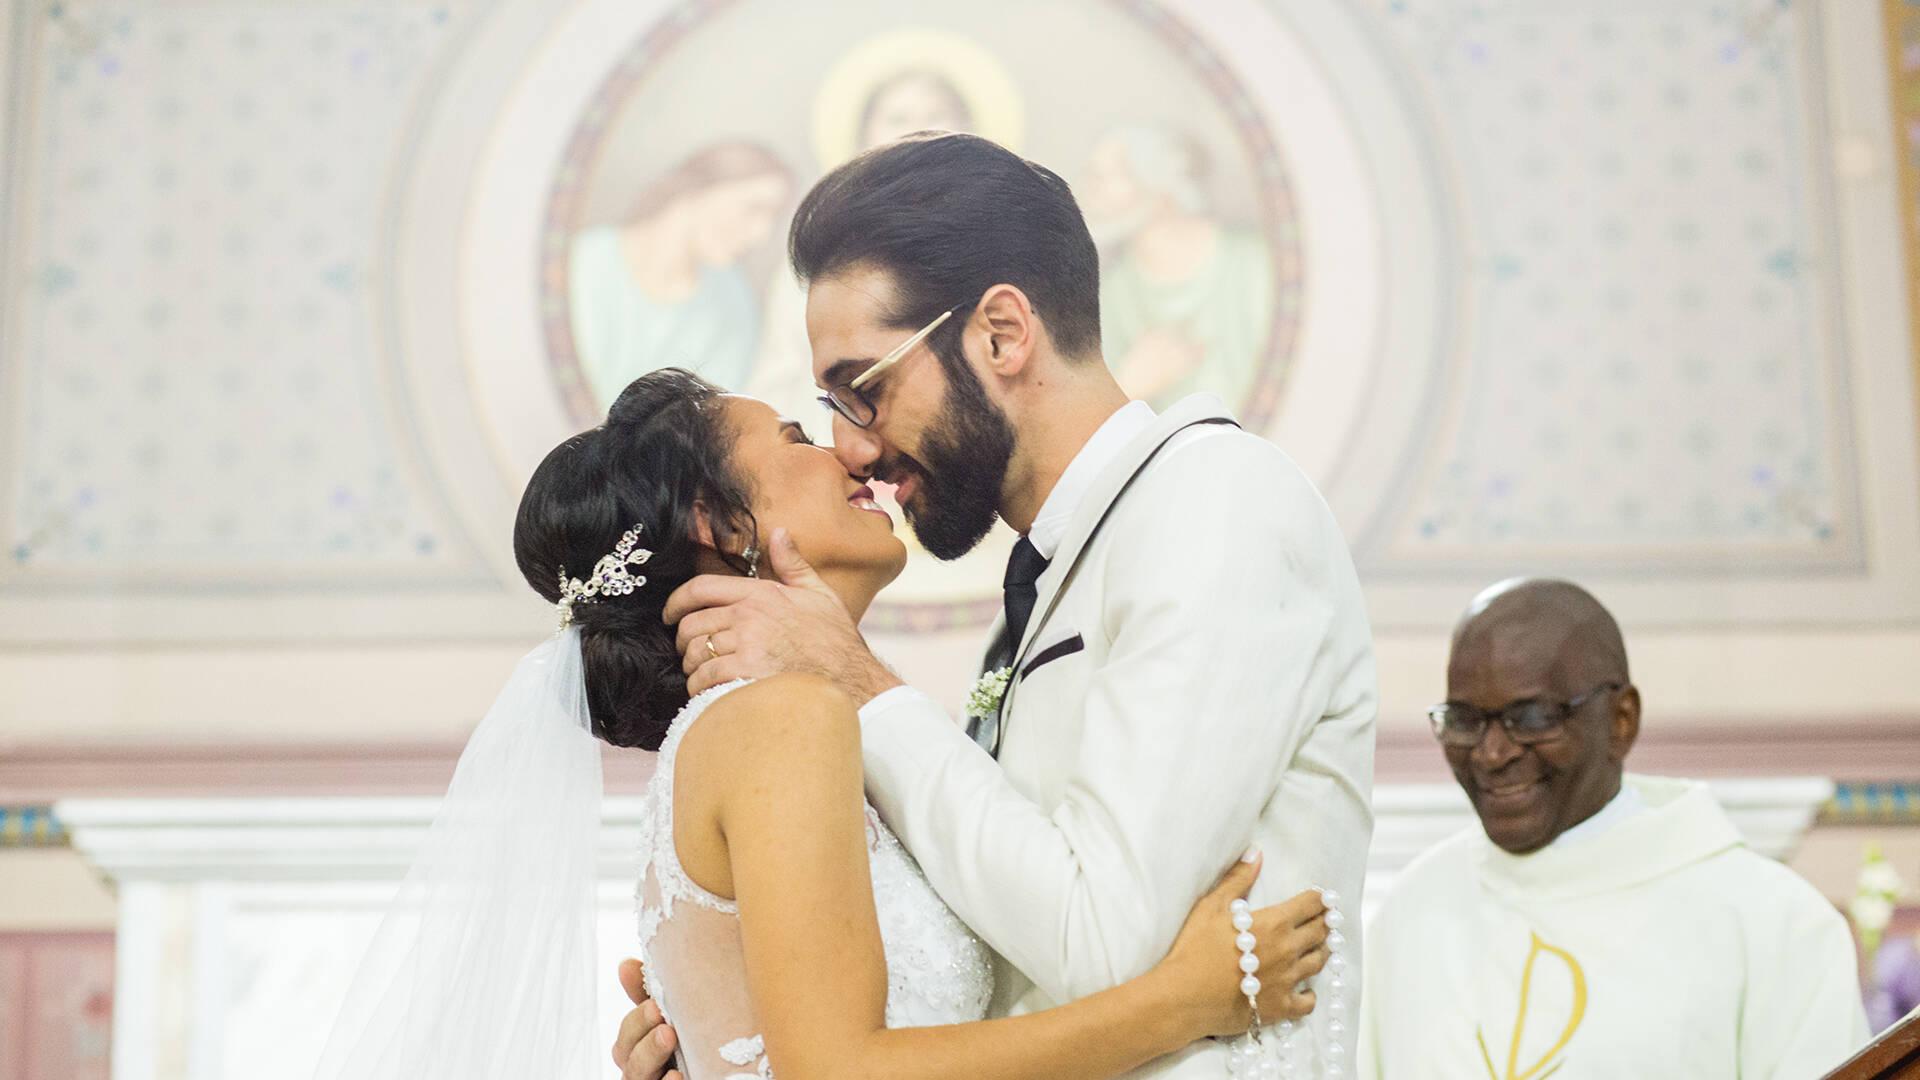 Casamento de Vanessa e Carlos